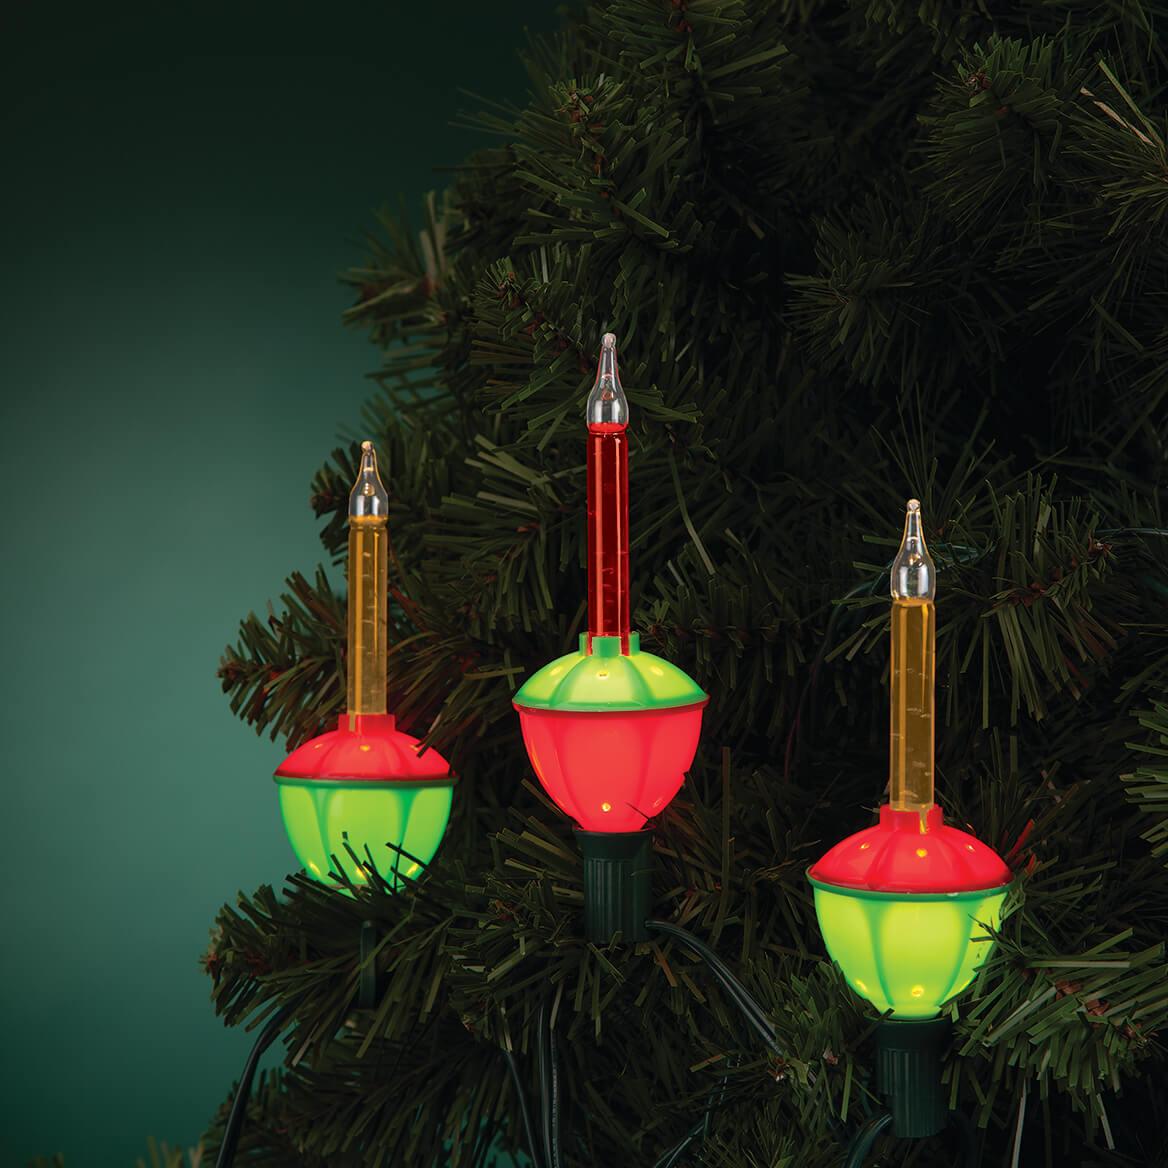 Christmas Bubble Lights